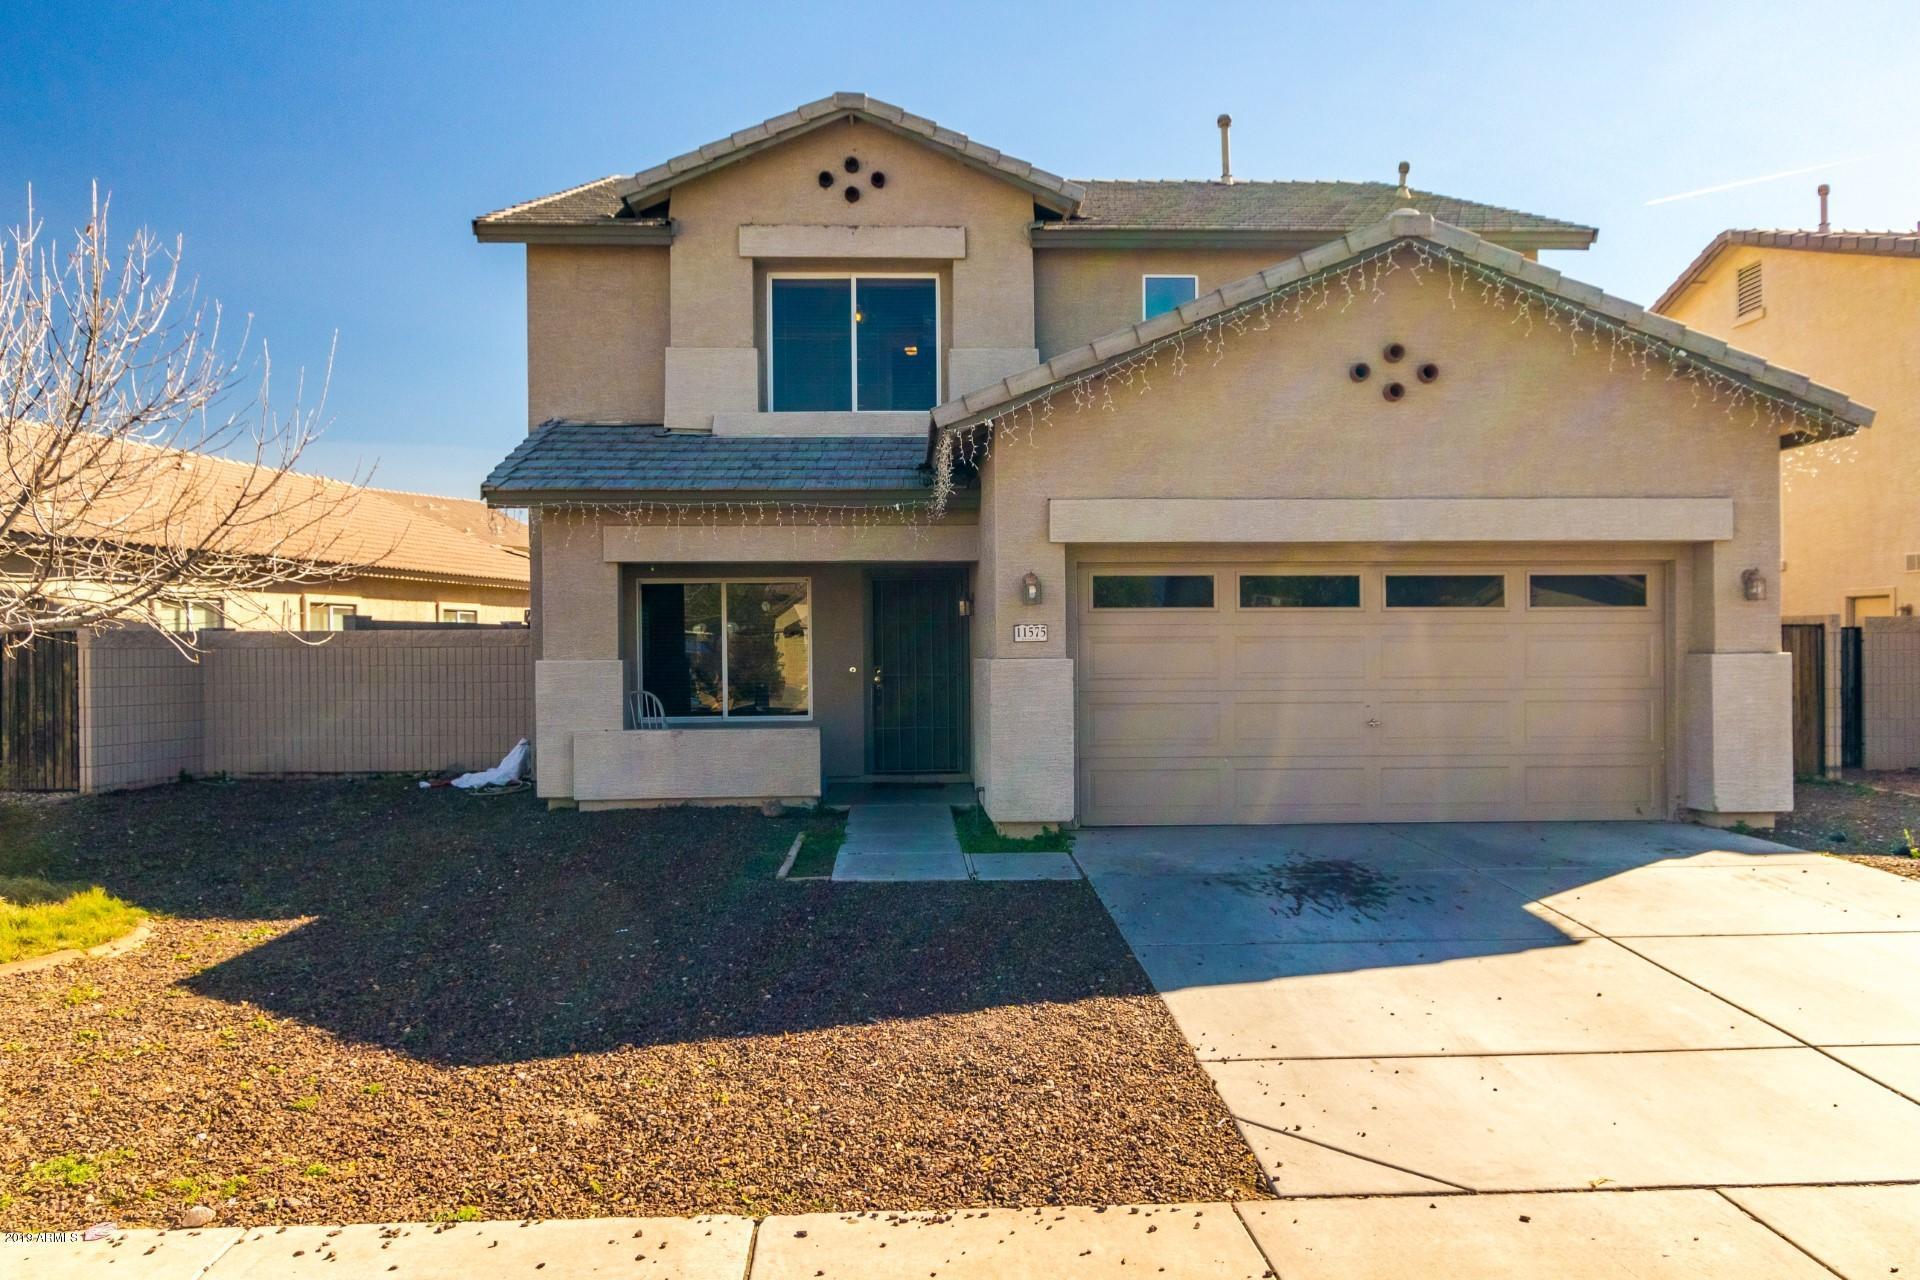 Photo of 11575 W HARRISON Street, Avondale, AZ 85323